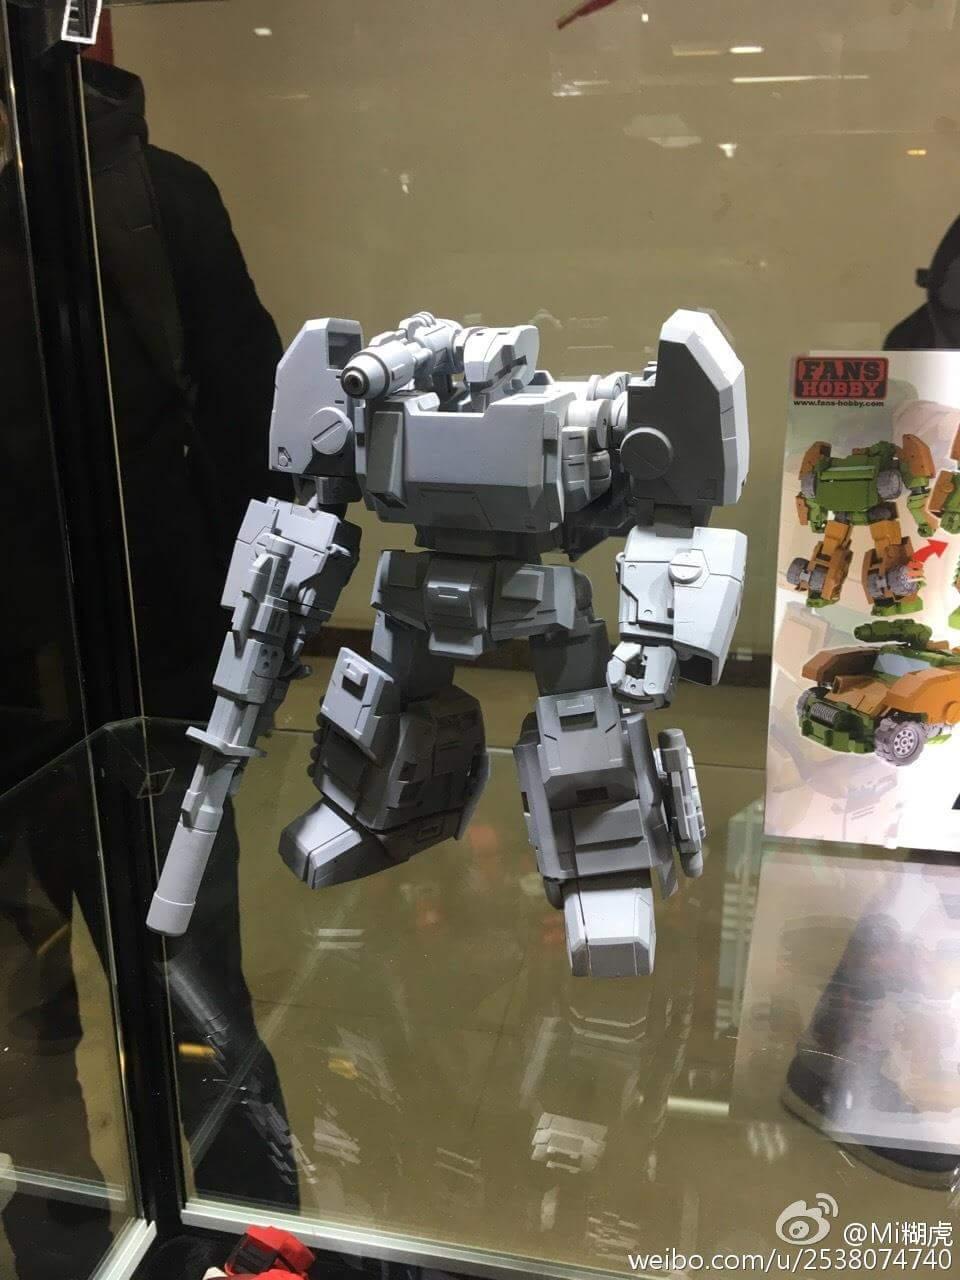 [FansHobby] Produit Tiers - Master Builder MB-07 Gun Buster - aka Roadbuster/Cahot des Wreckers IDW WjGQ2KWE